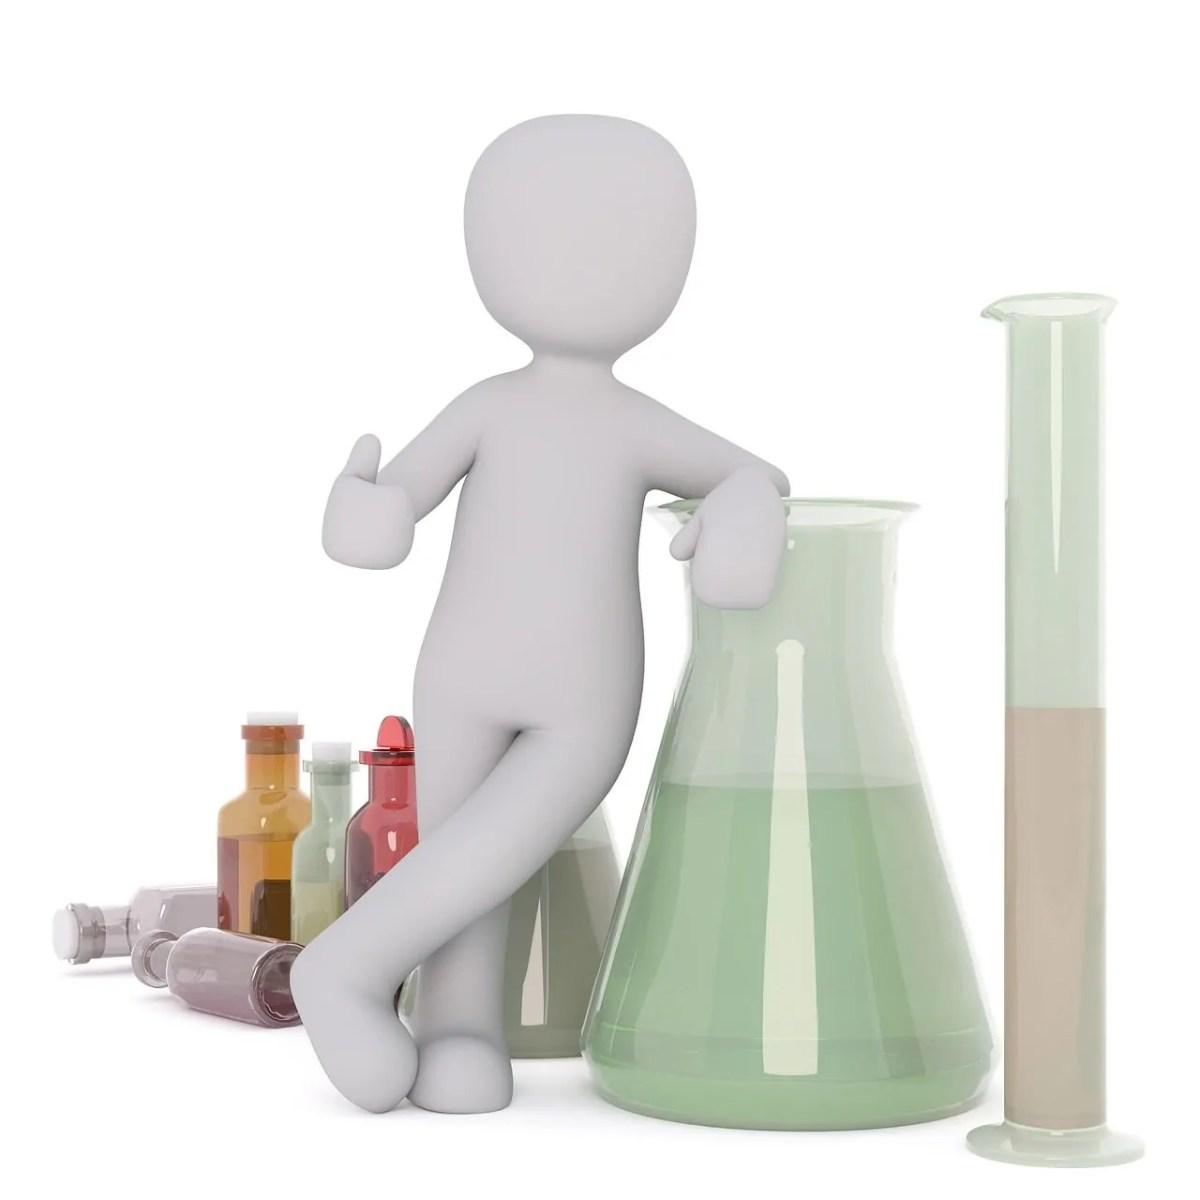 penelitian dan pengembangan produk kosmetik